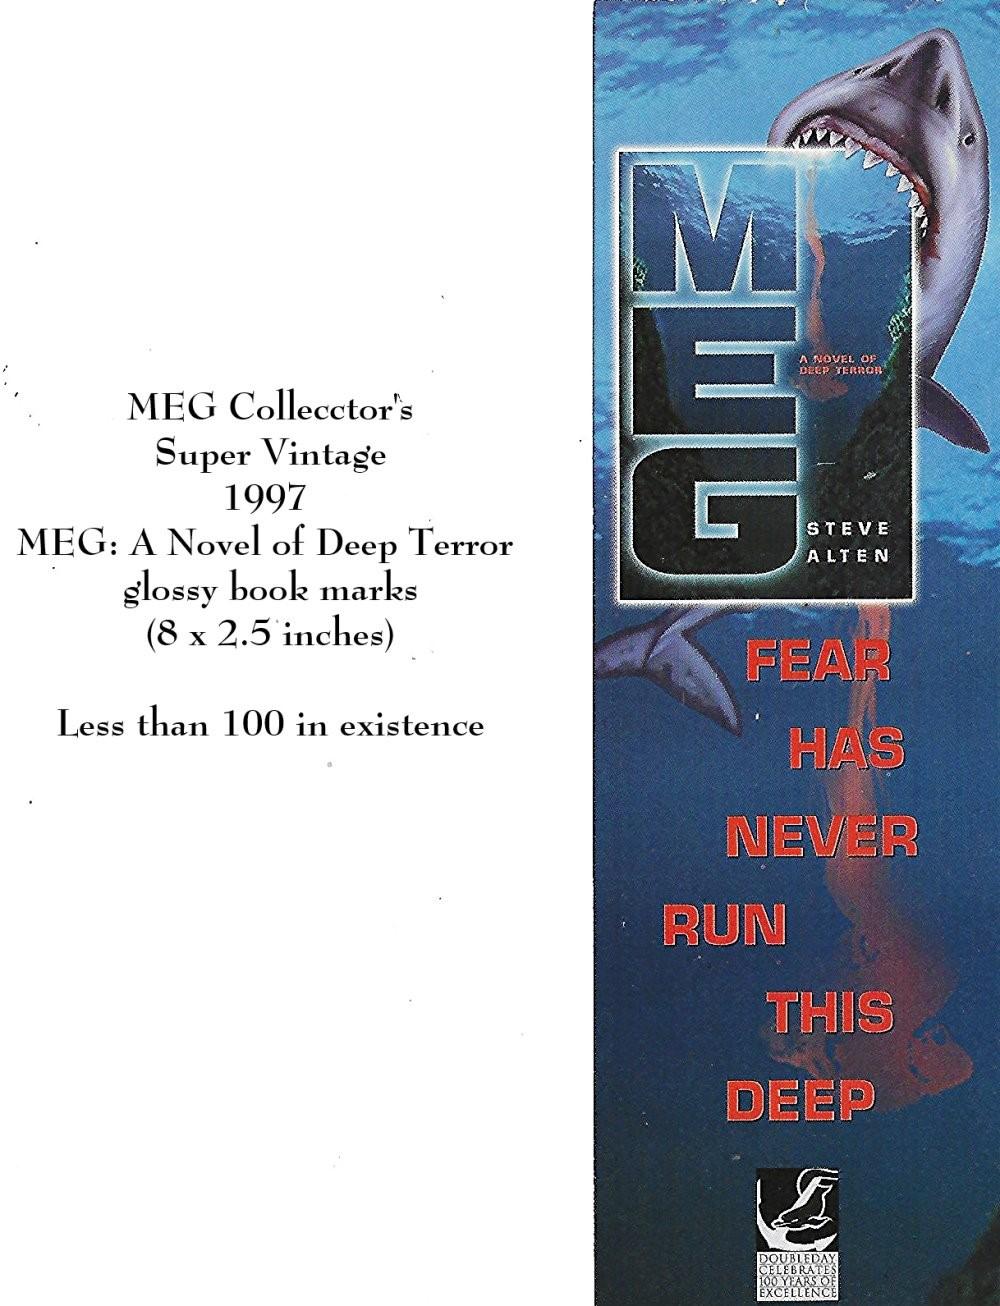 MEG: A Novel of Deep Terror glossy book marks